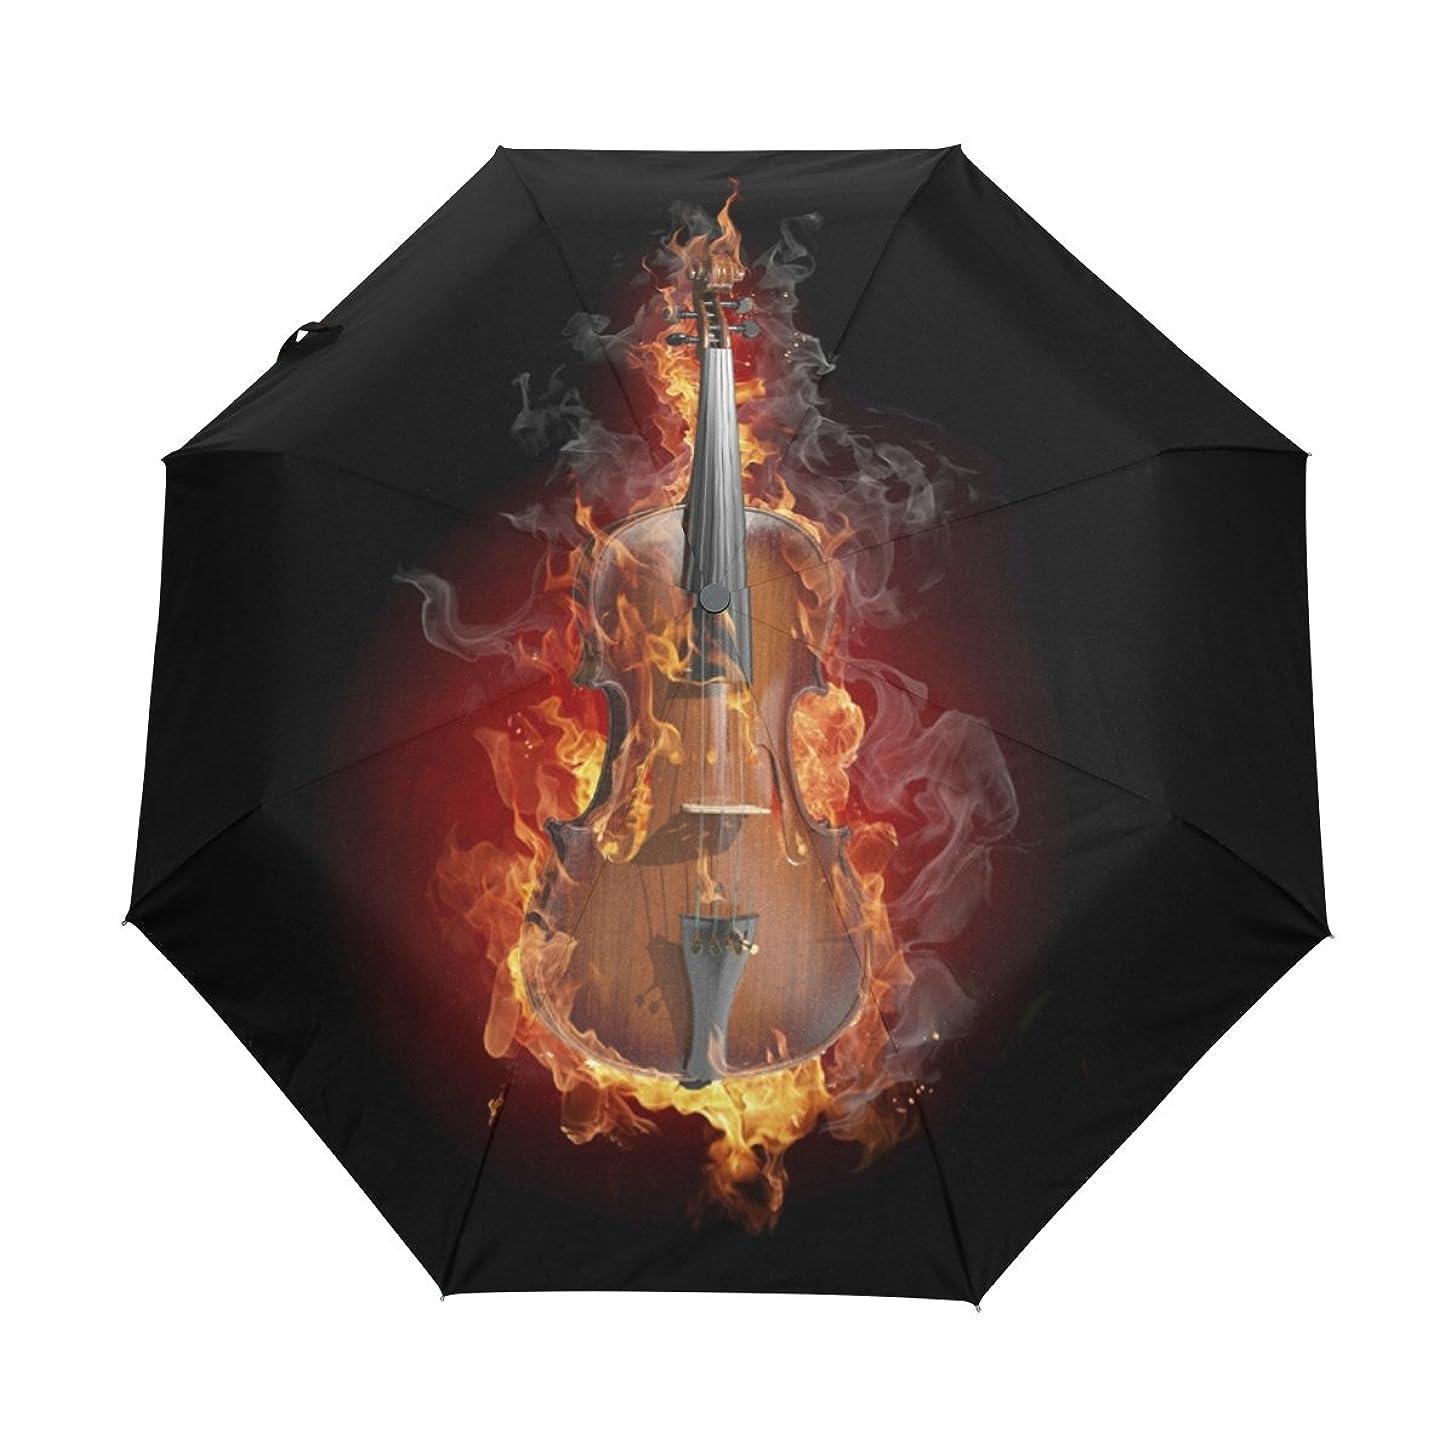 Ethel Ernest Burning Violin Folding Windproof Umbrella Waterproof Auto Foldable Umbrella